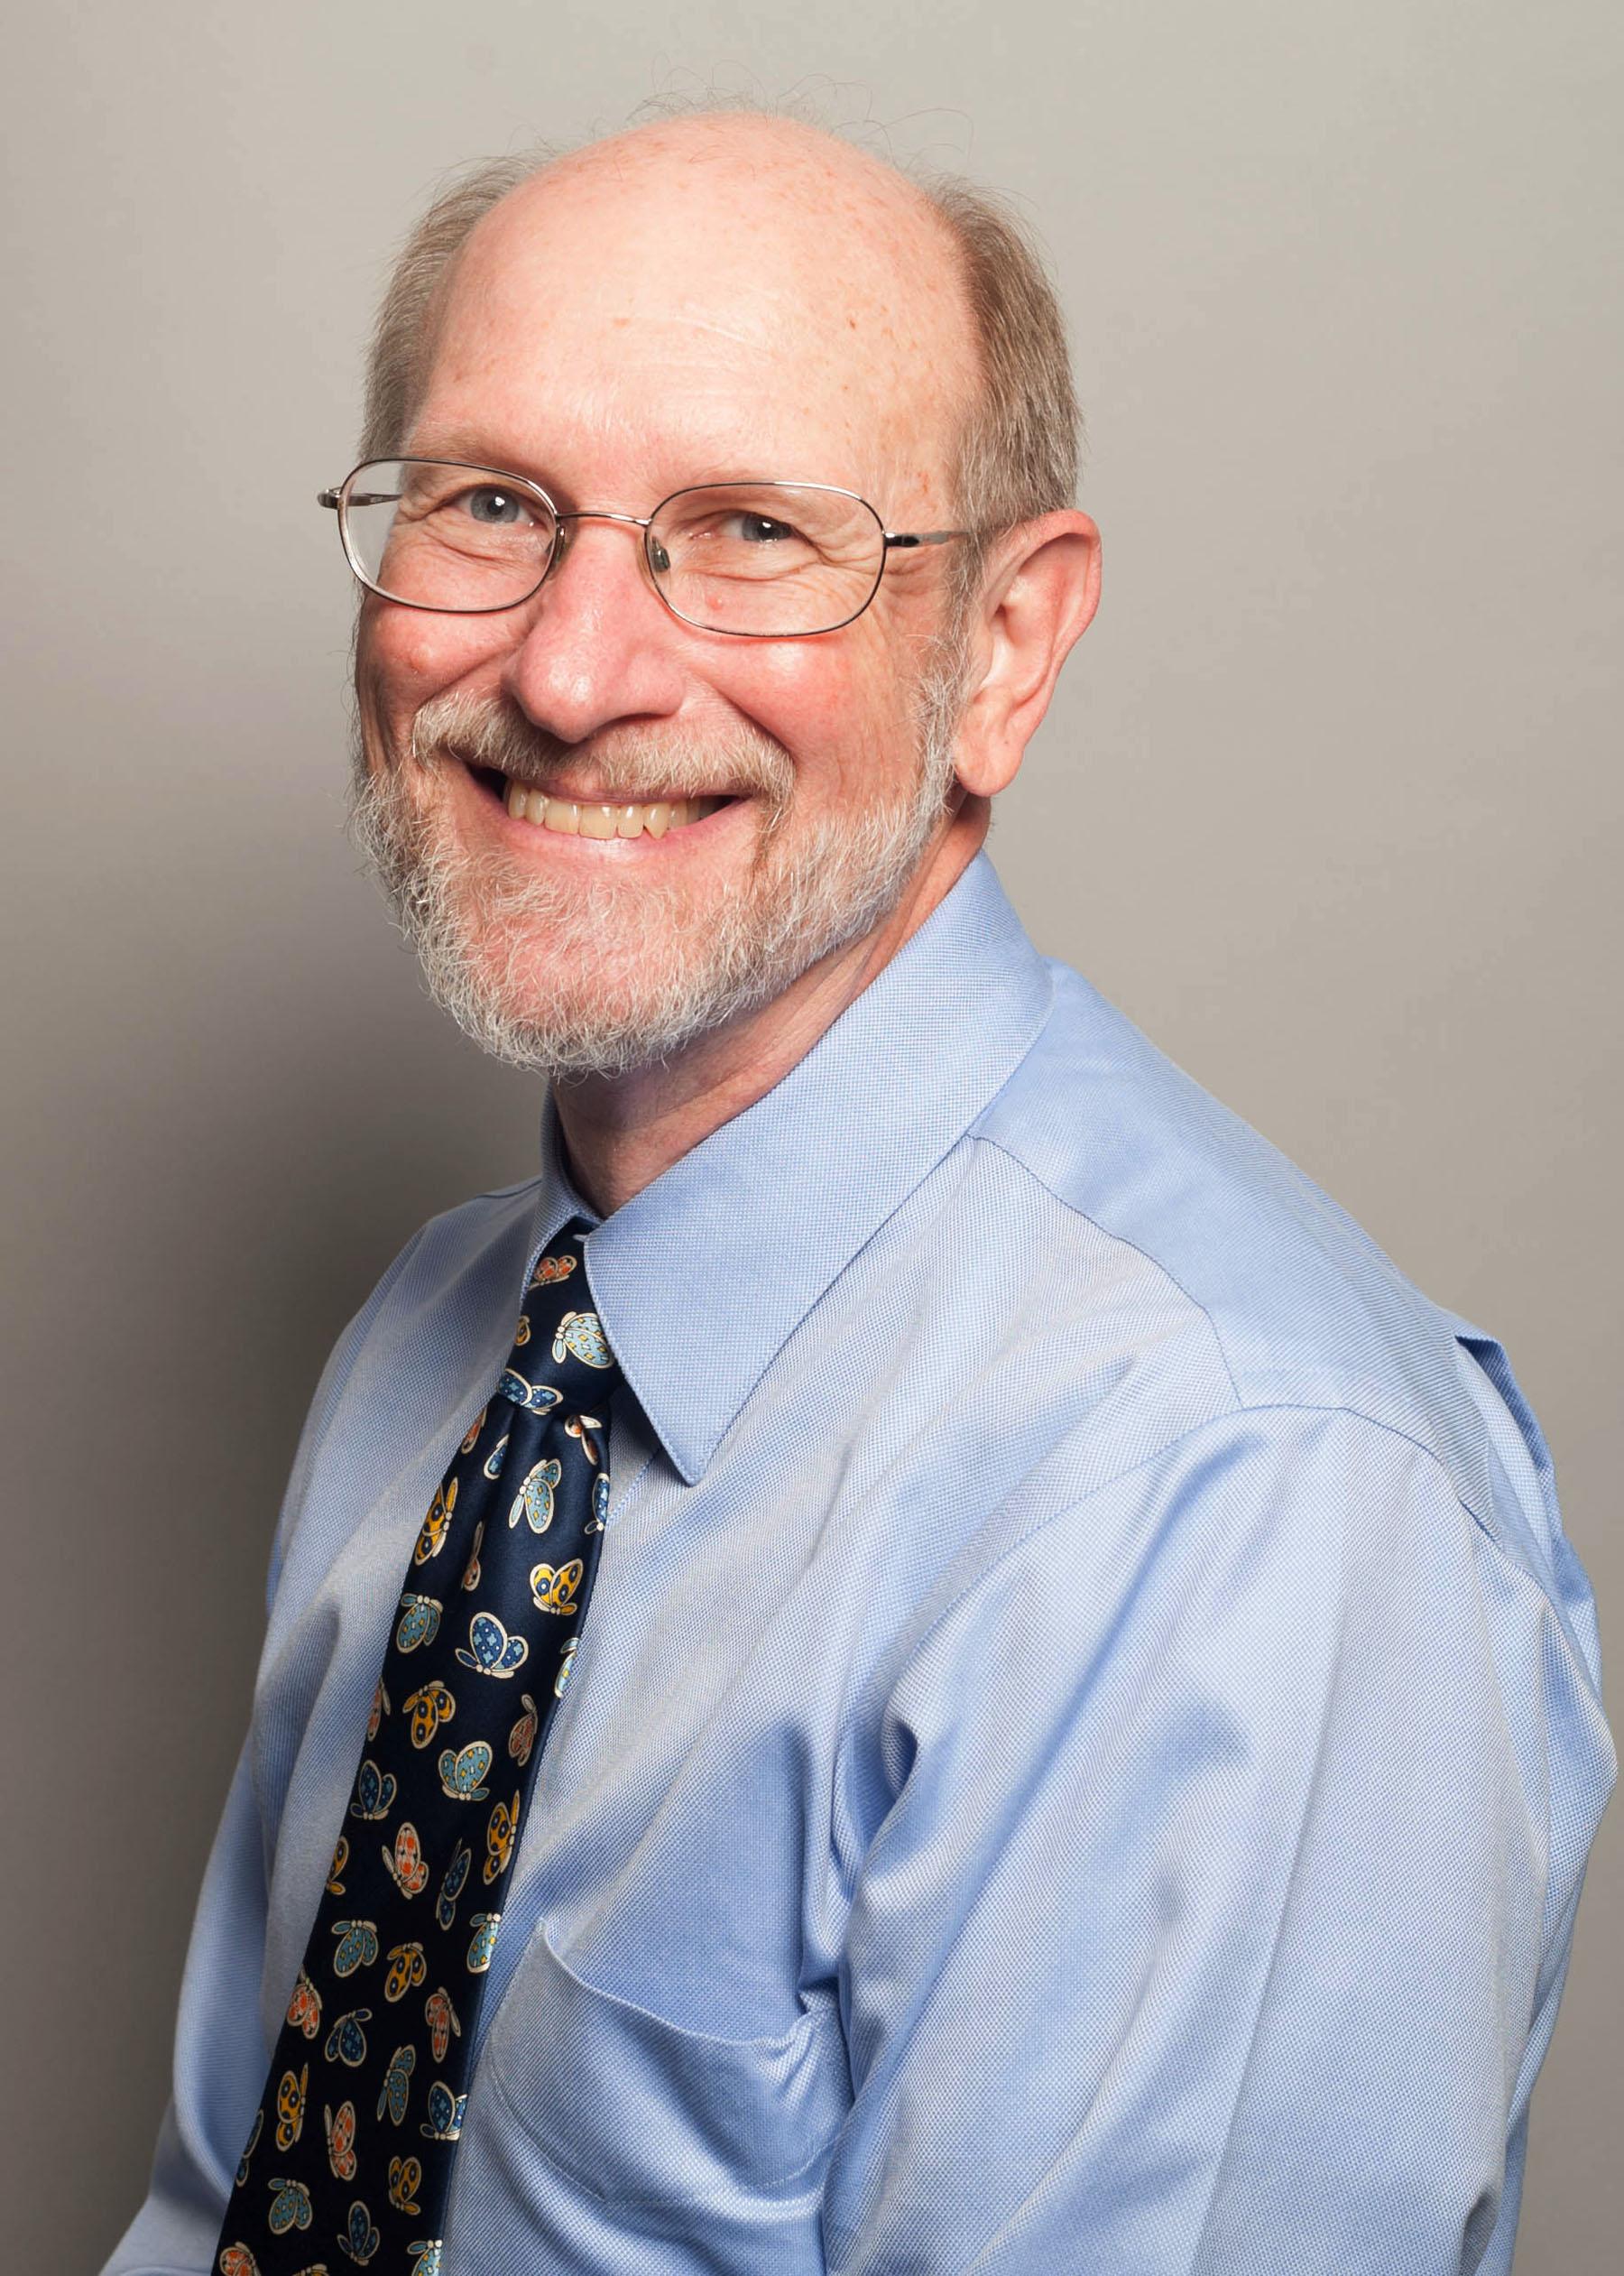 John Grunow, MD